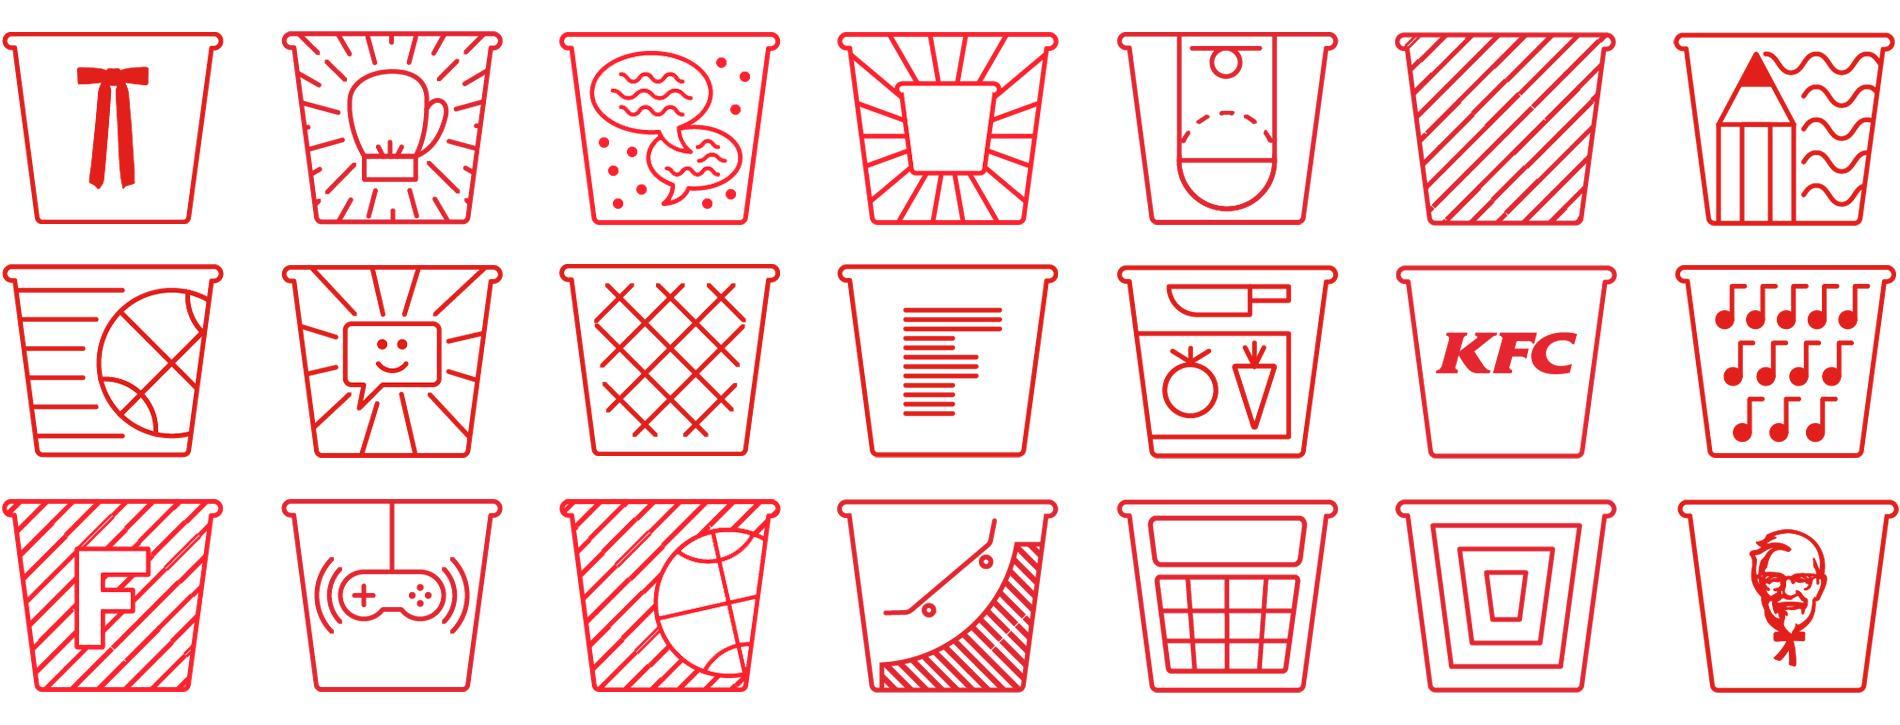 KFC bucket illustrations